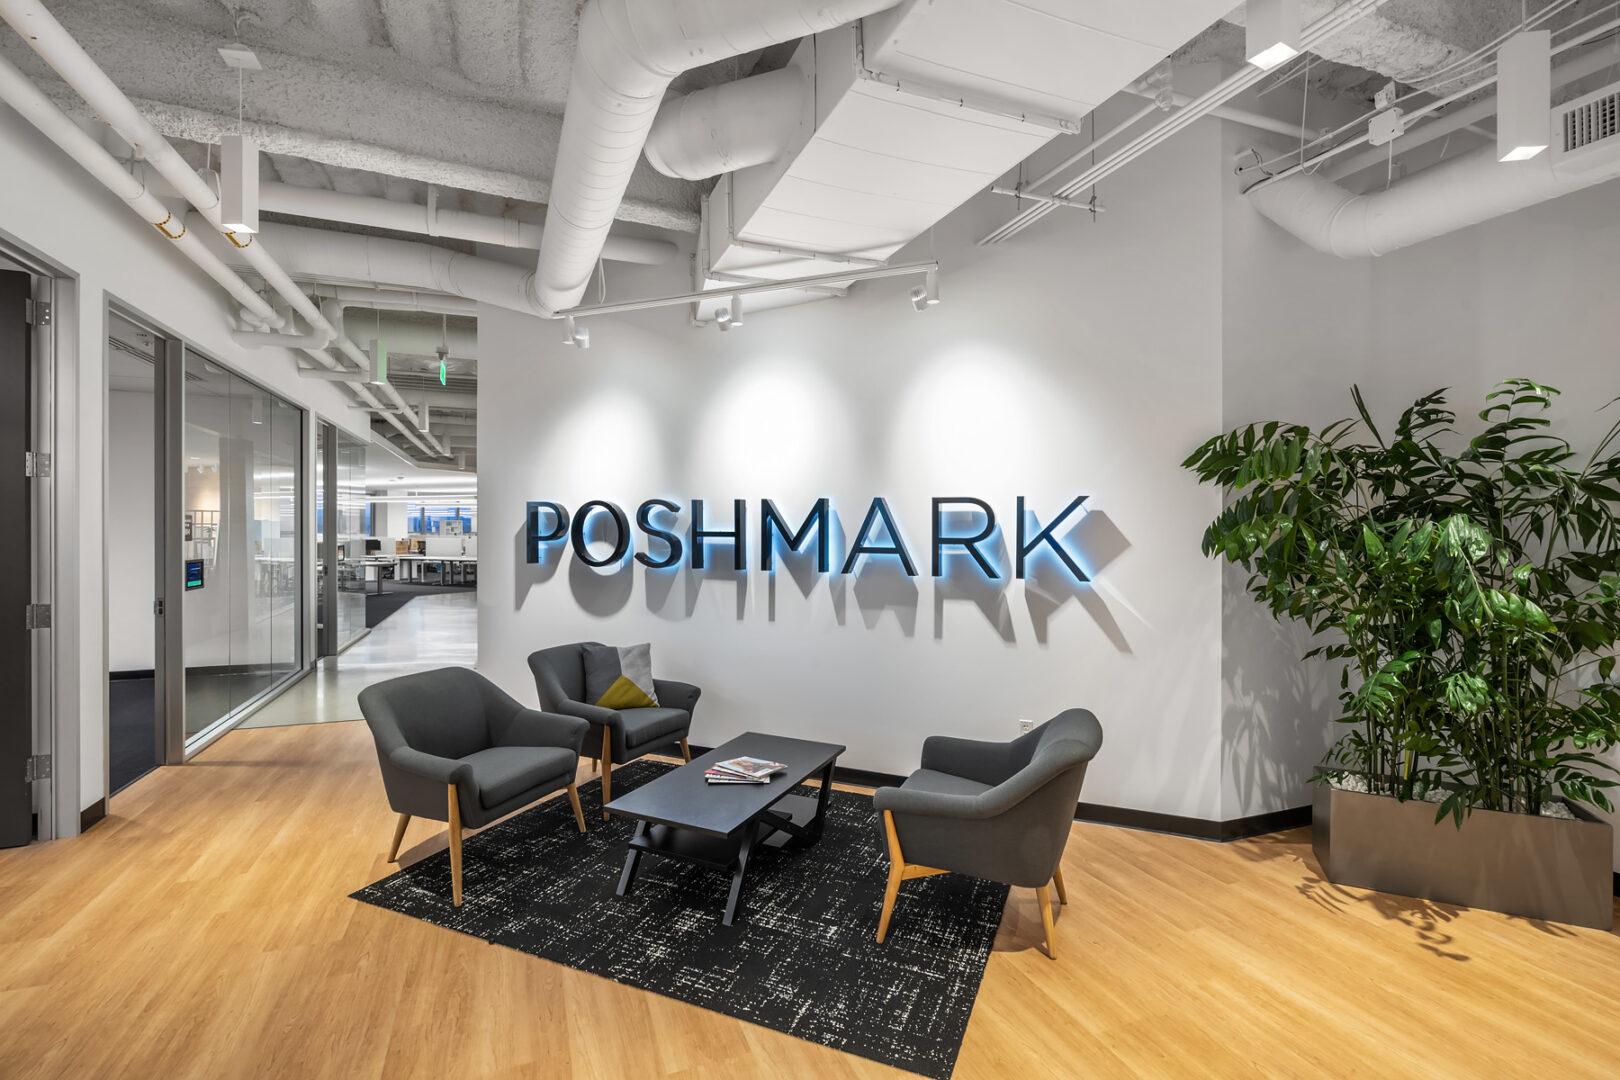 Web_01 Poshmark